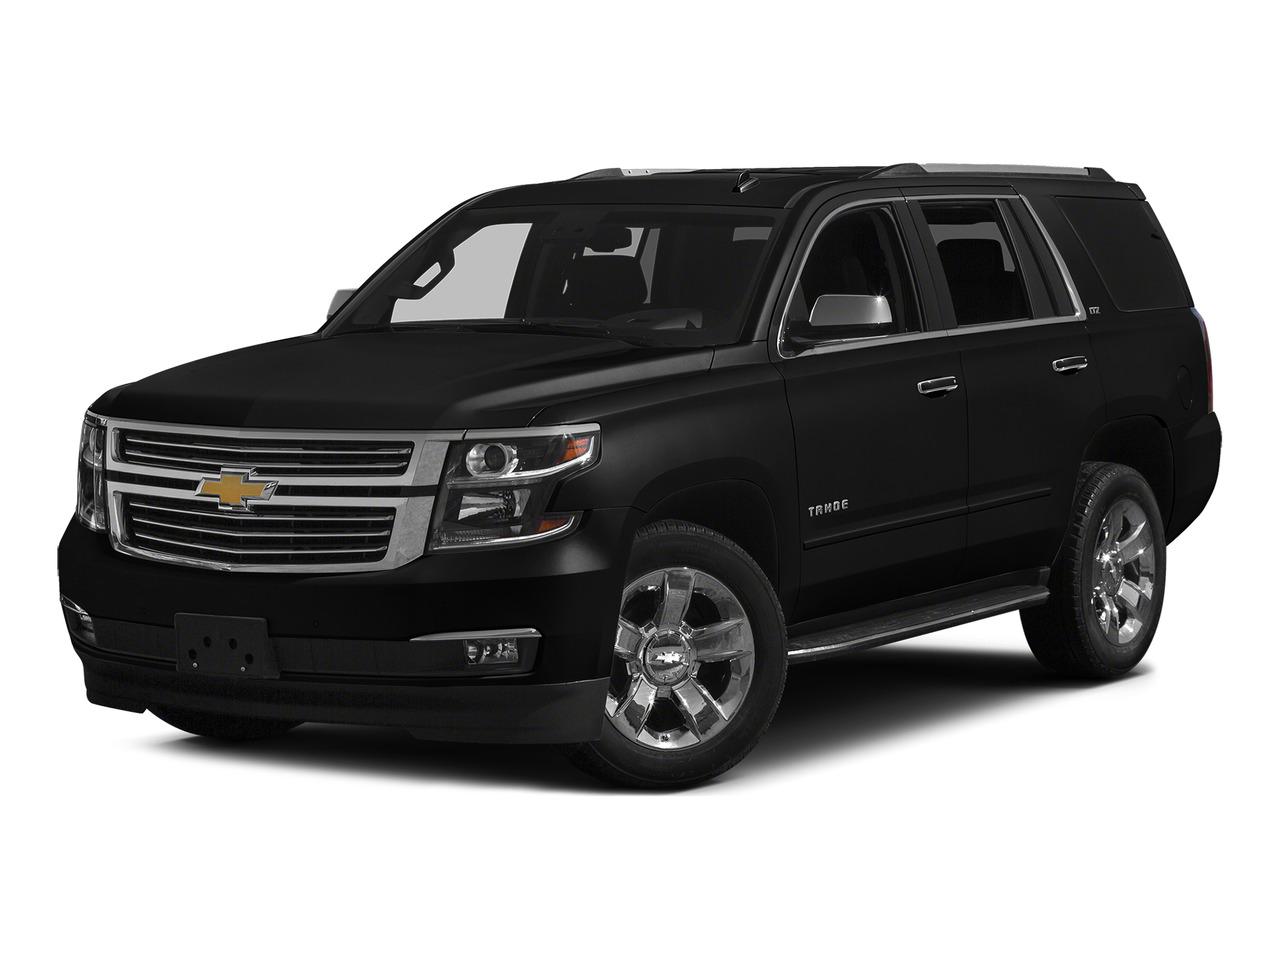 Black 2015 Chevrolet Tahoe LTZ SUV Wake Forest NC